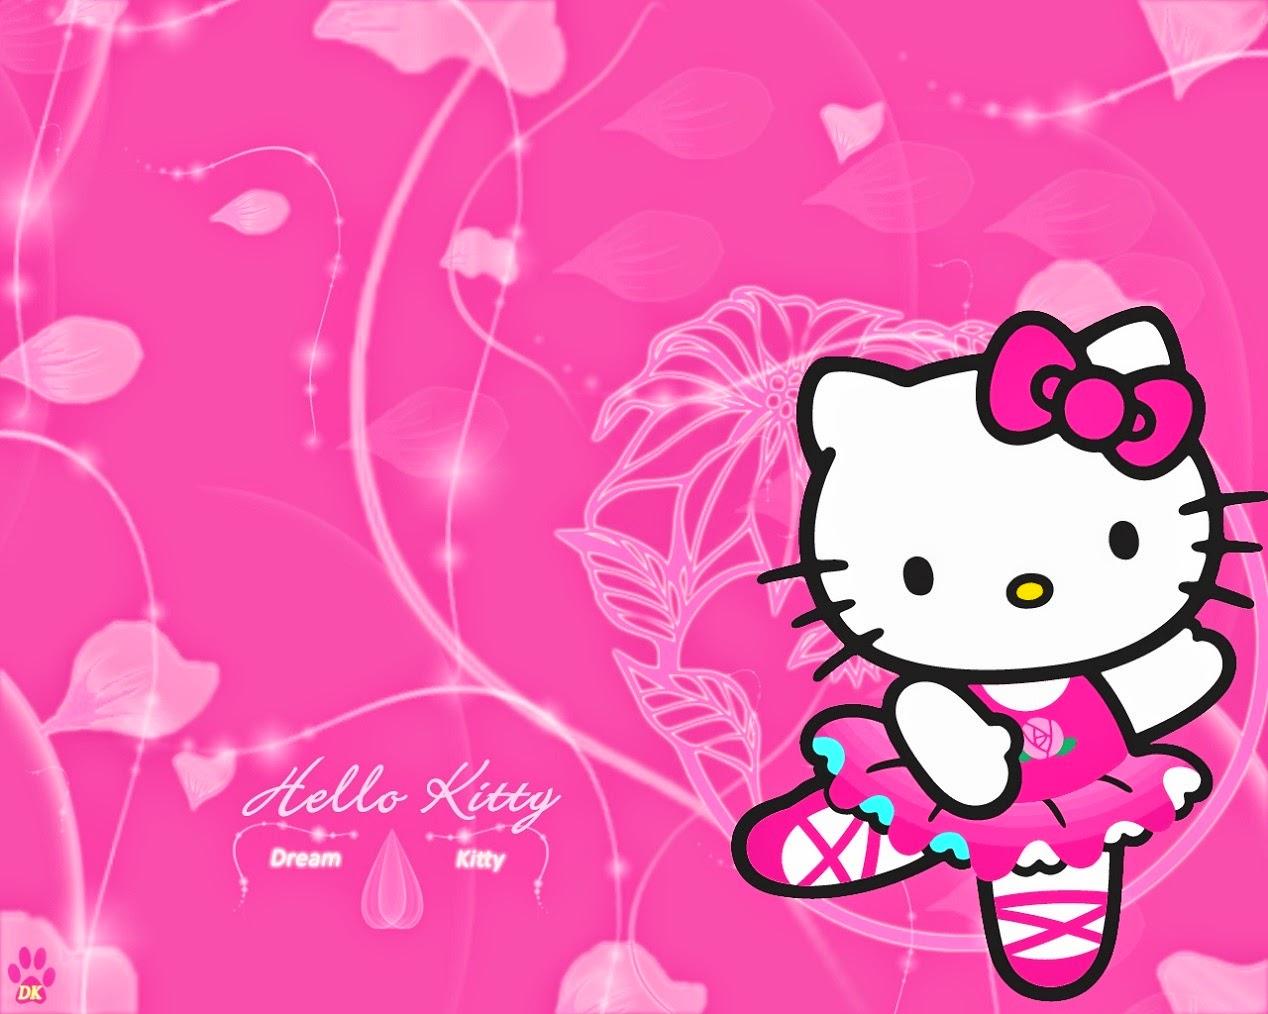 30 Best Hello Kitty Hd Wallpapers